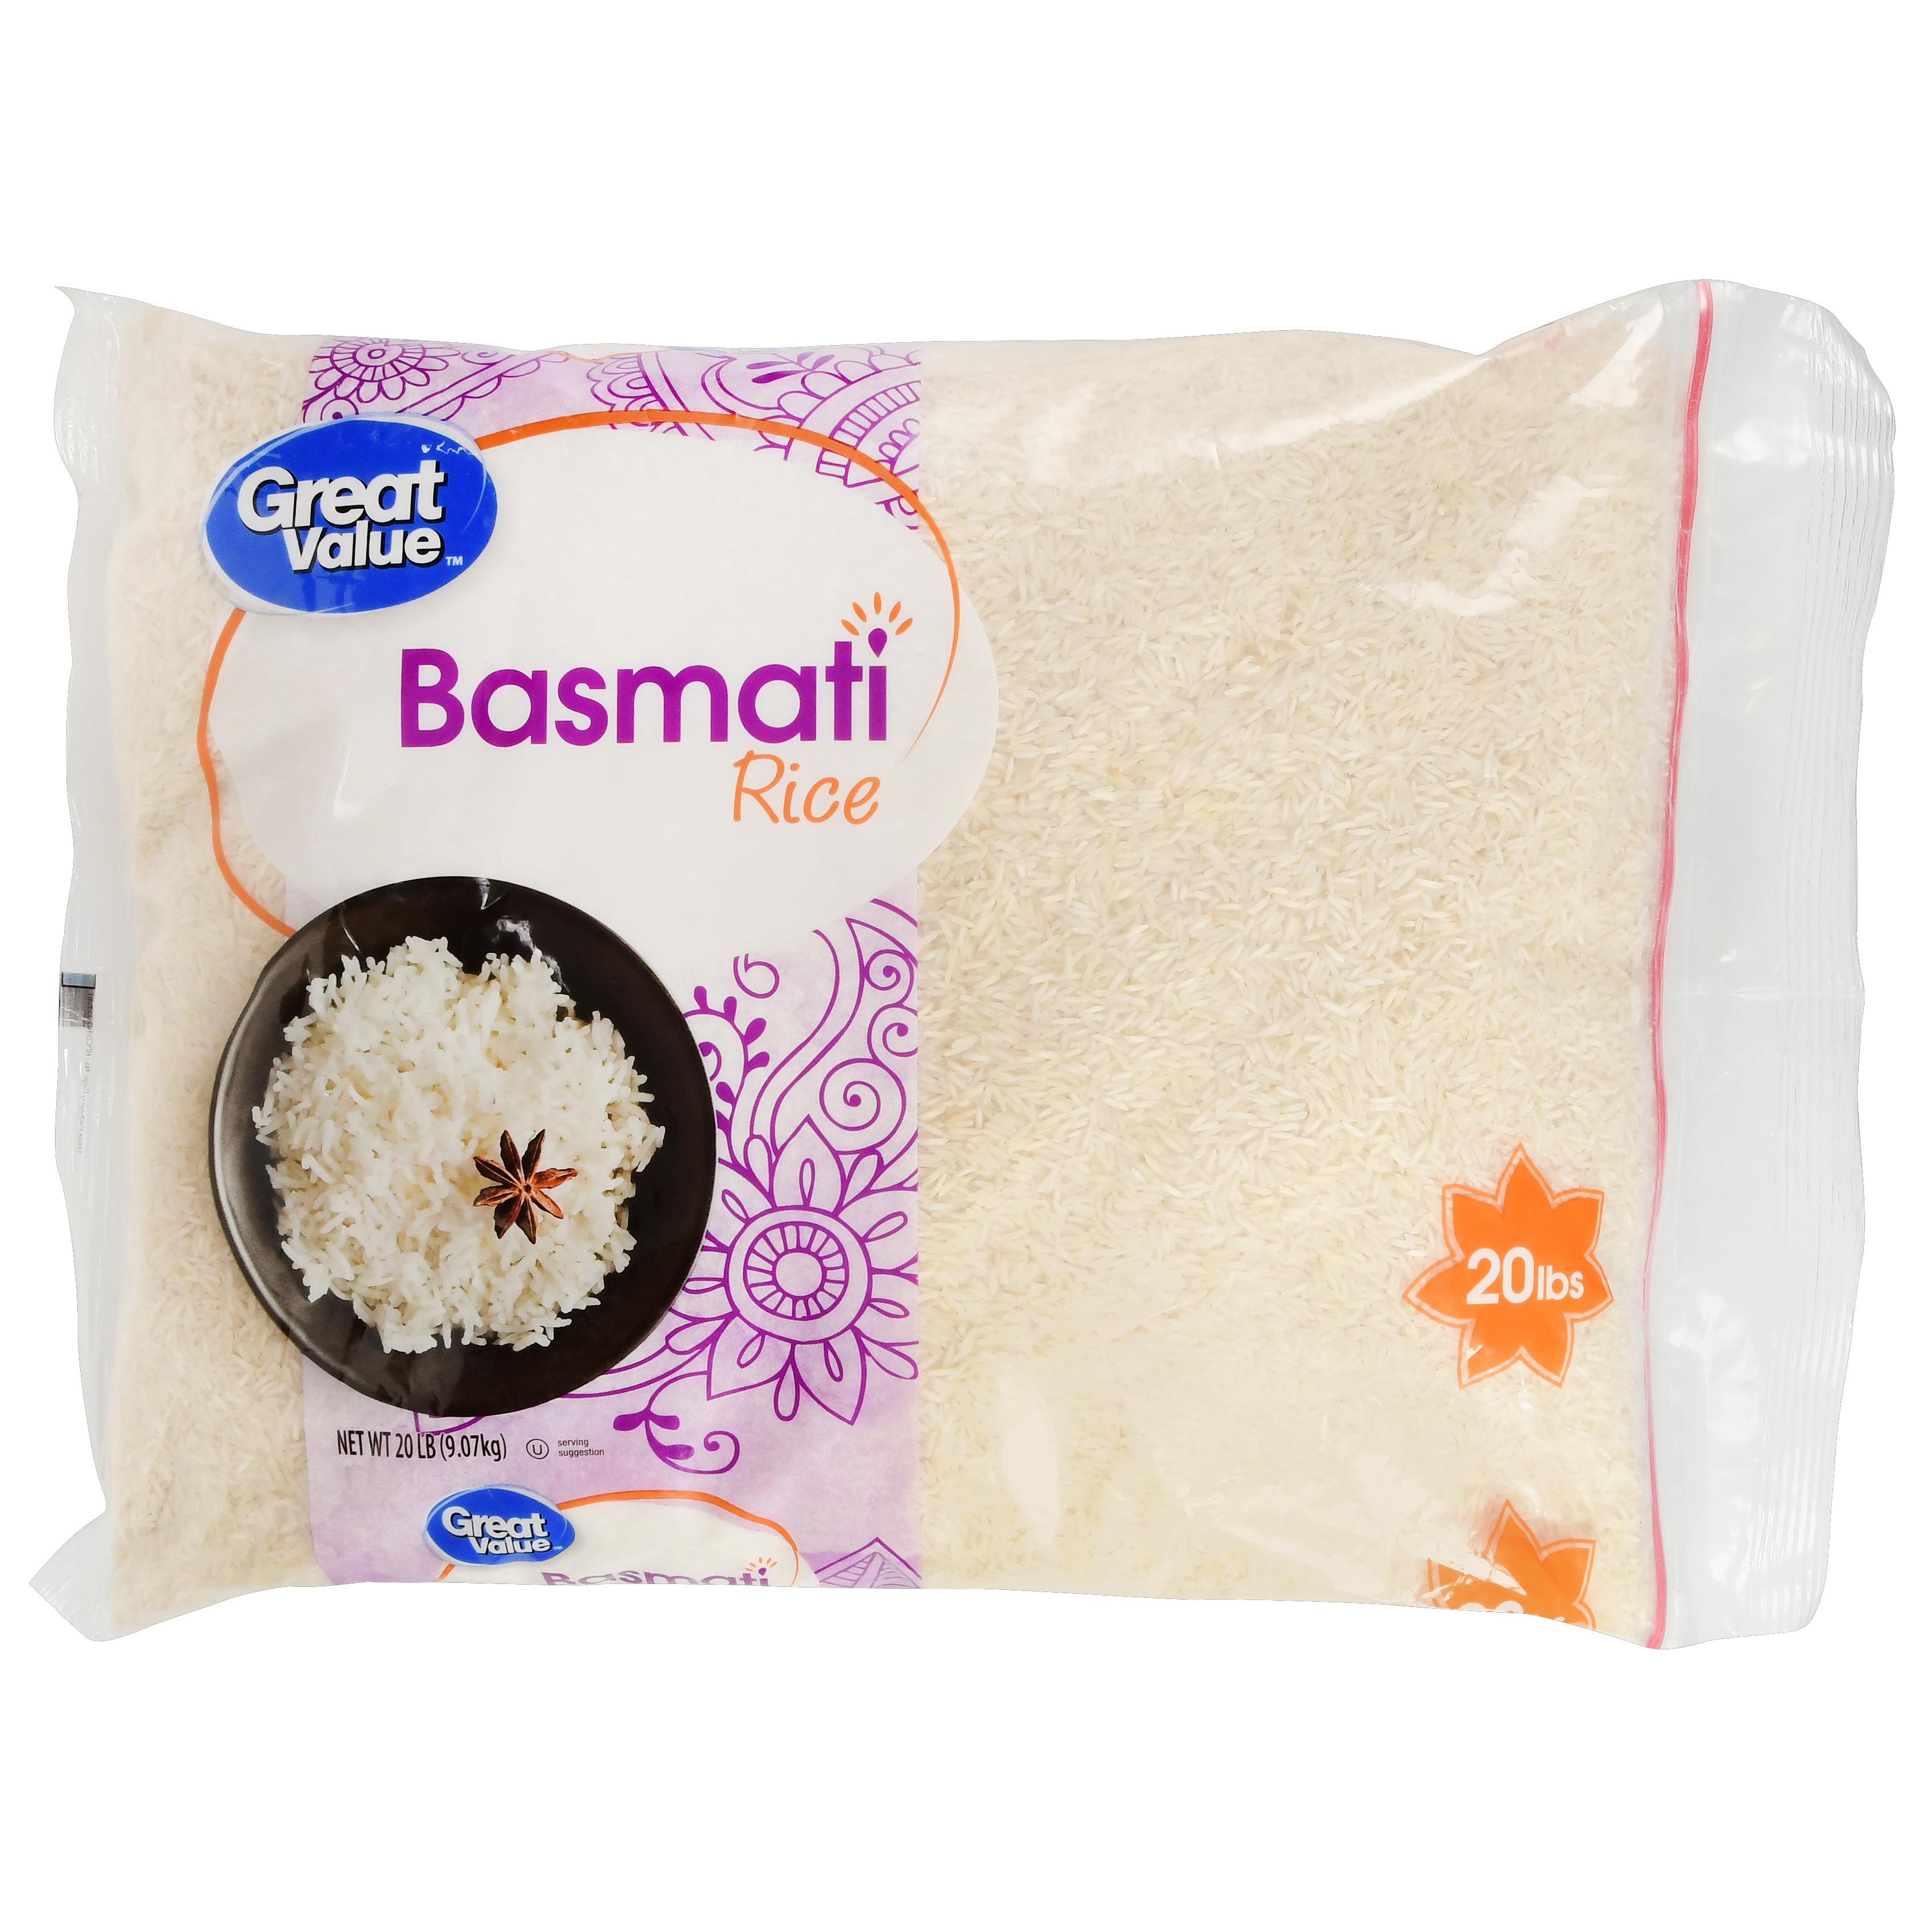 Great Value Basmati Rice, 20 Lb - $0.98/lb